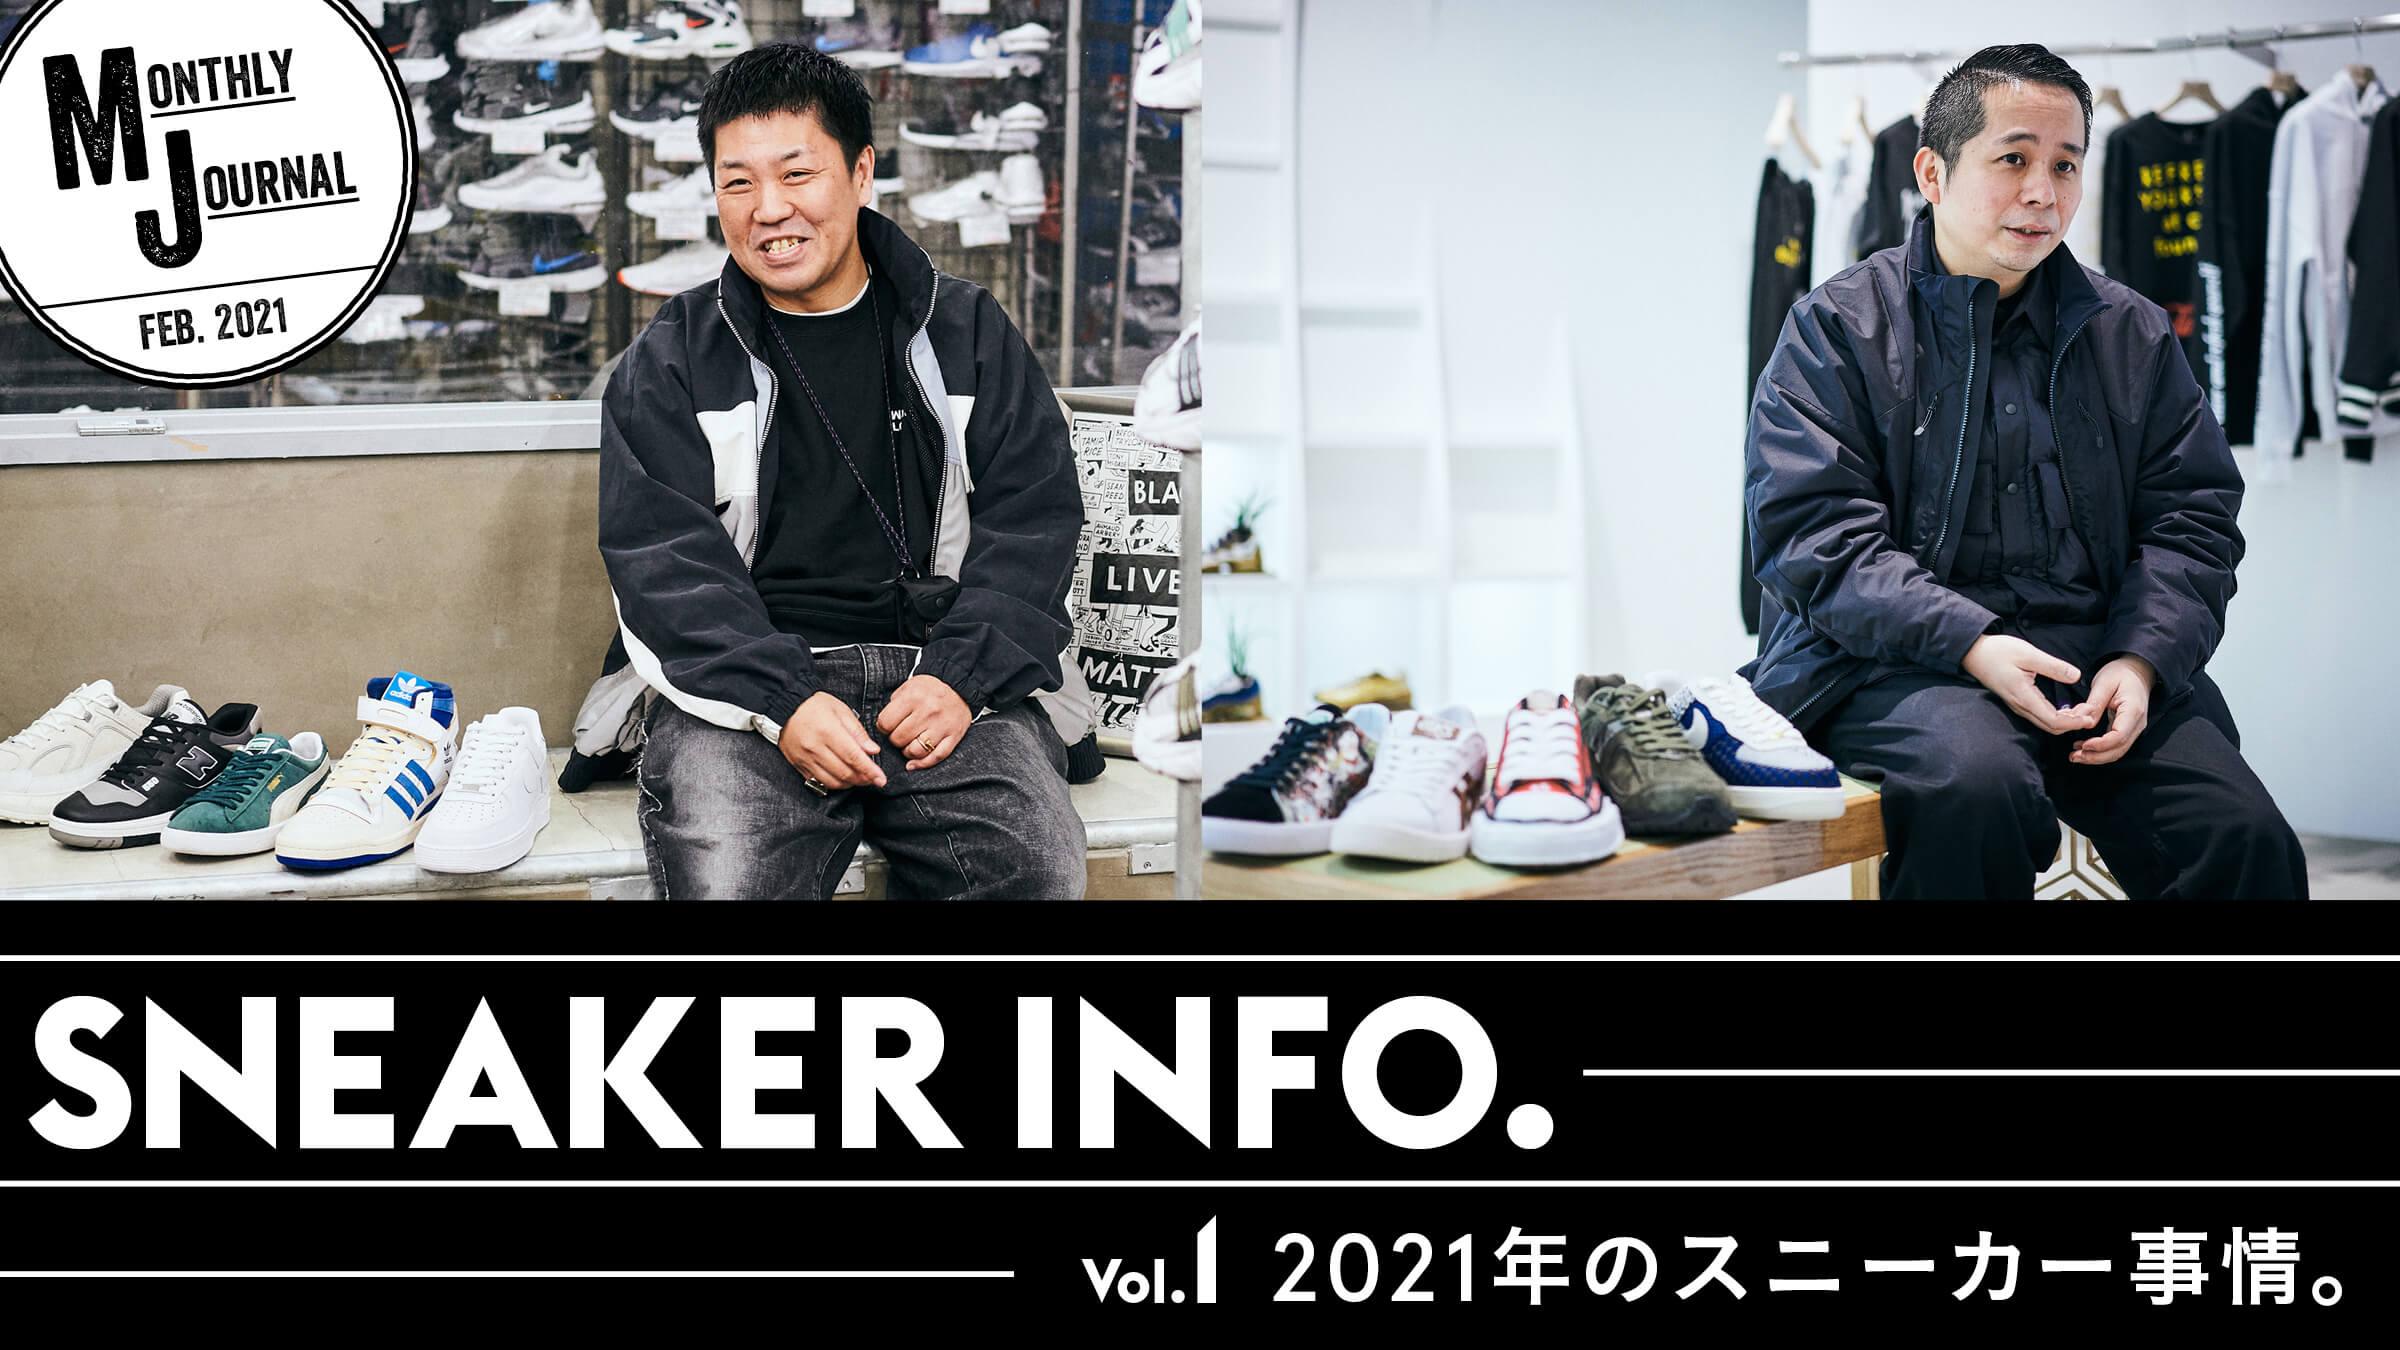 SNEAKER INFO. Vol.1 2021年のスニーカー事情。